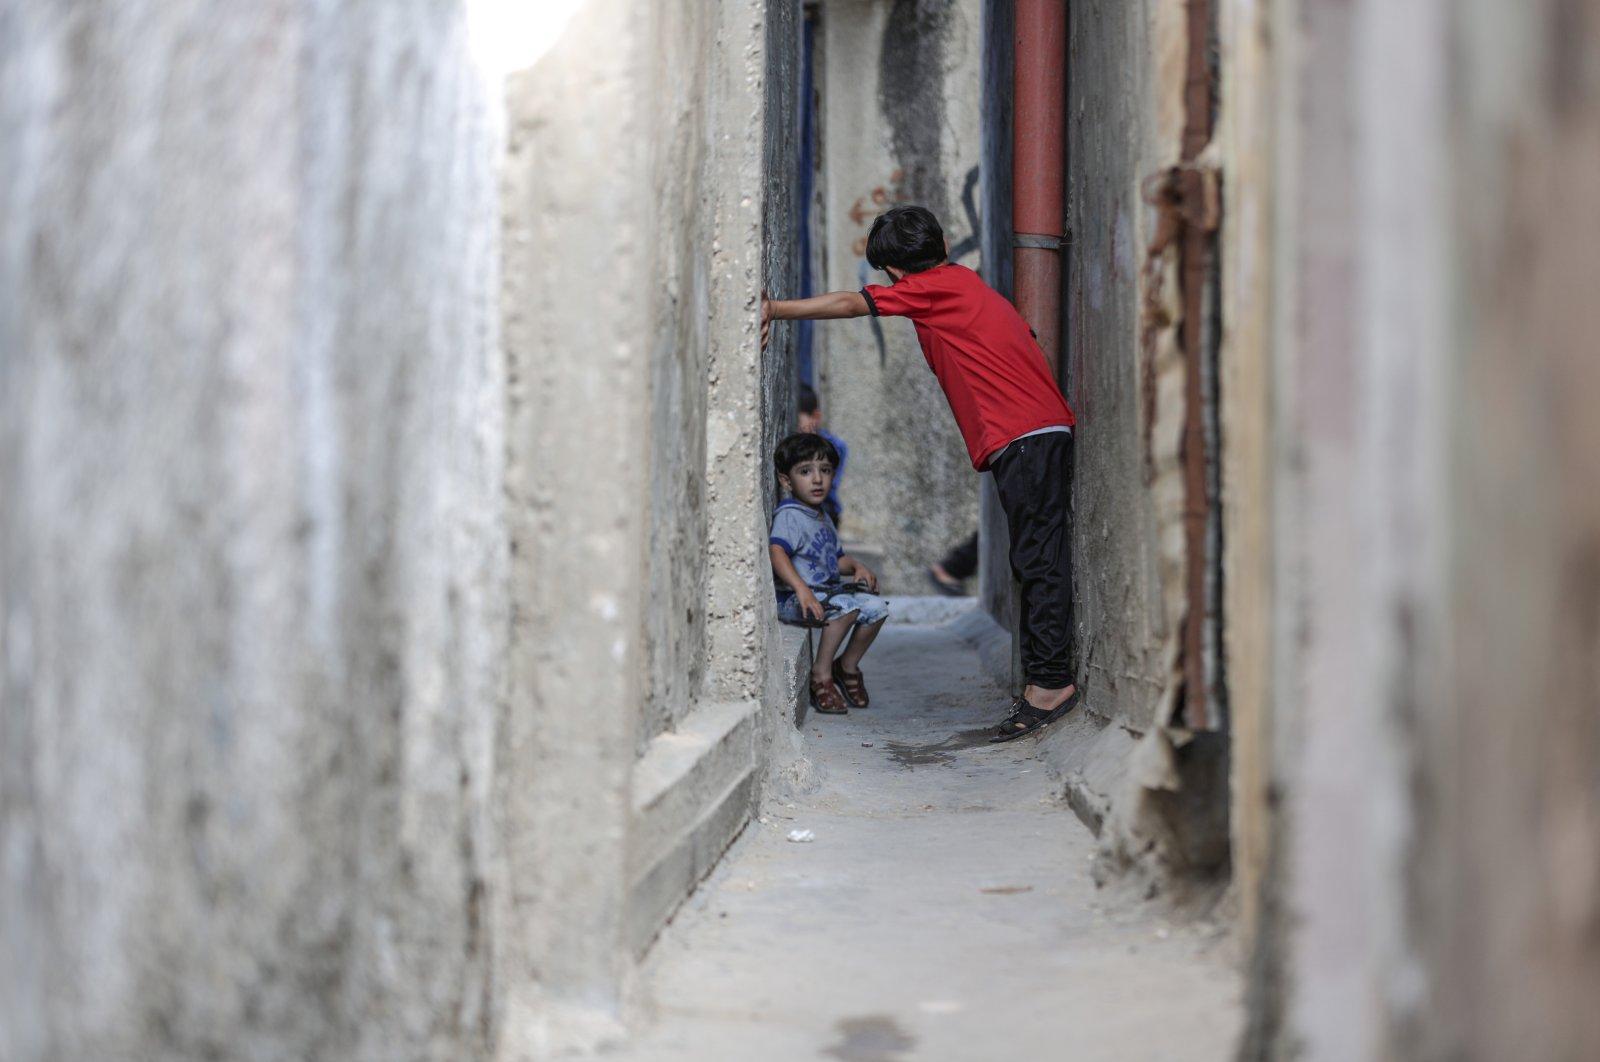 Two Palestinian children are seen in Jabalia refugee camp, Gaza Strip, Palestine, June 21, 2020. (AA Photo)